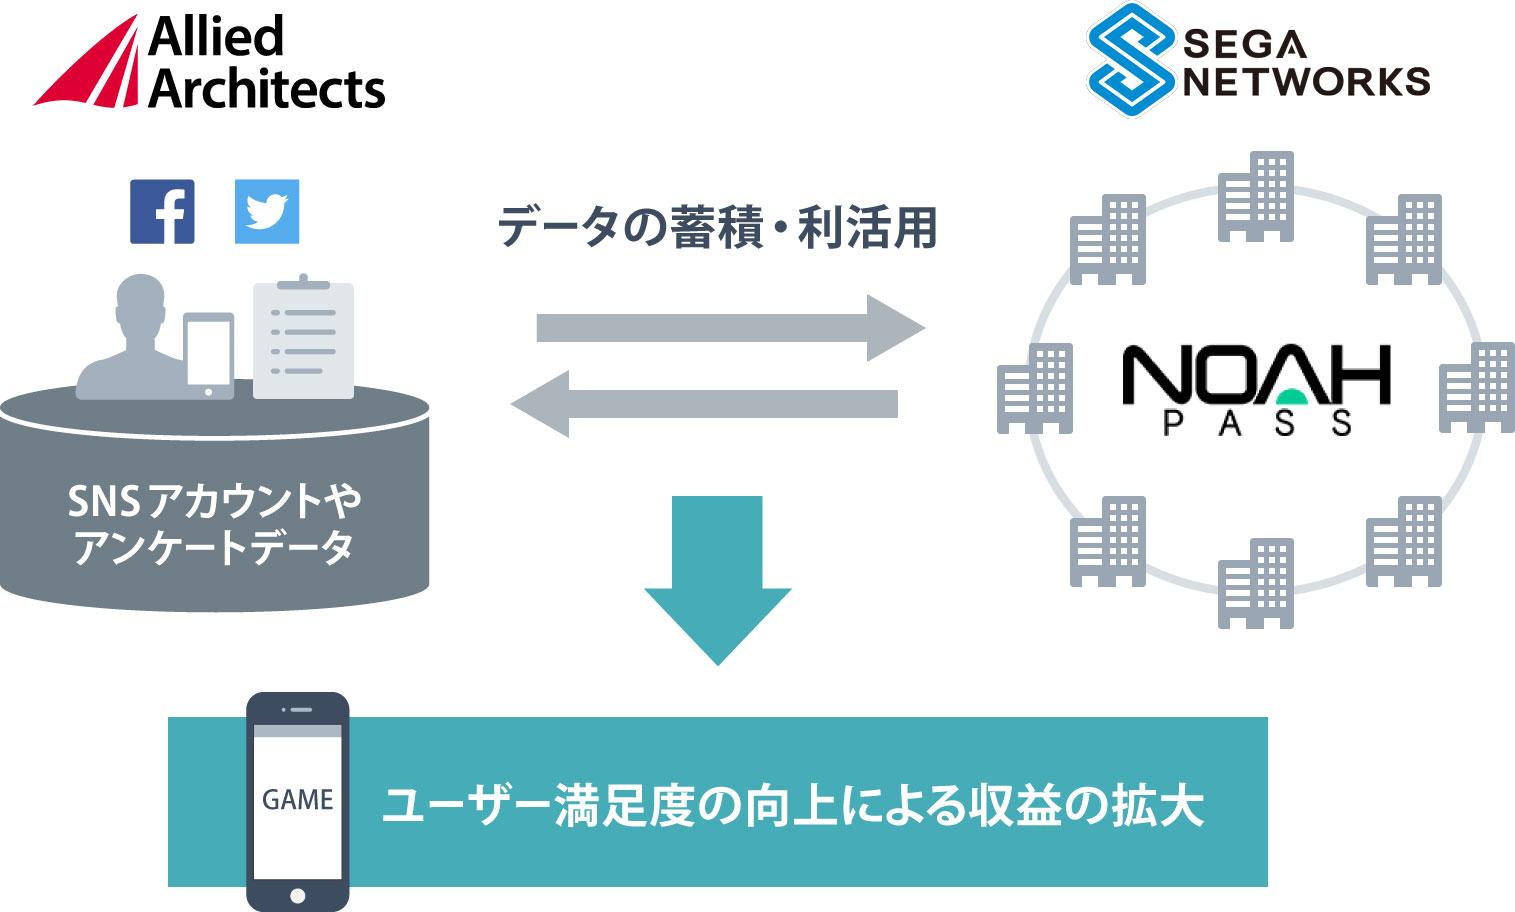 AA_SEGA NETWORKS